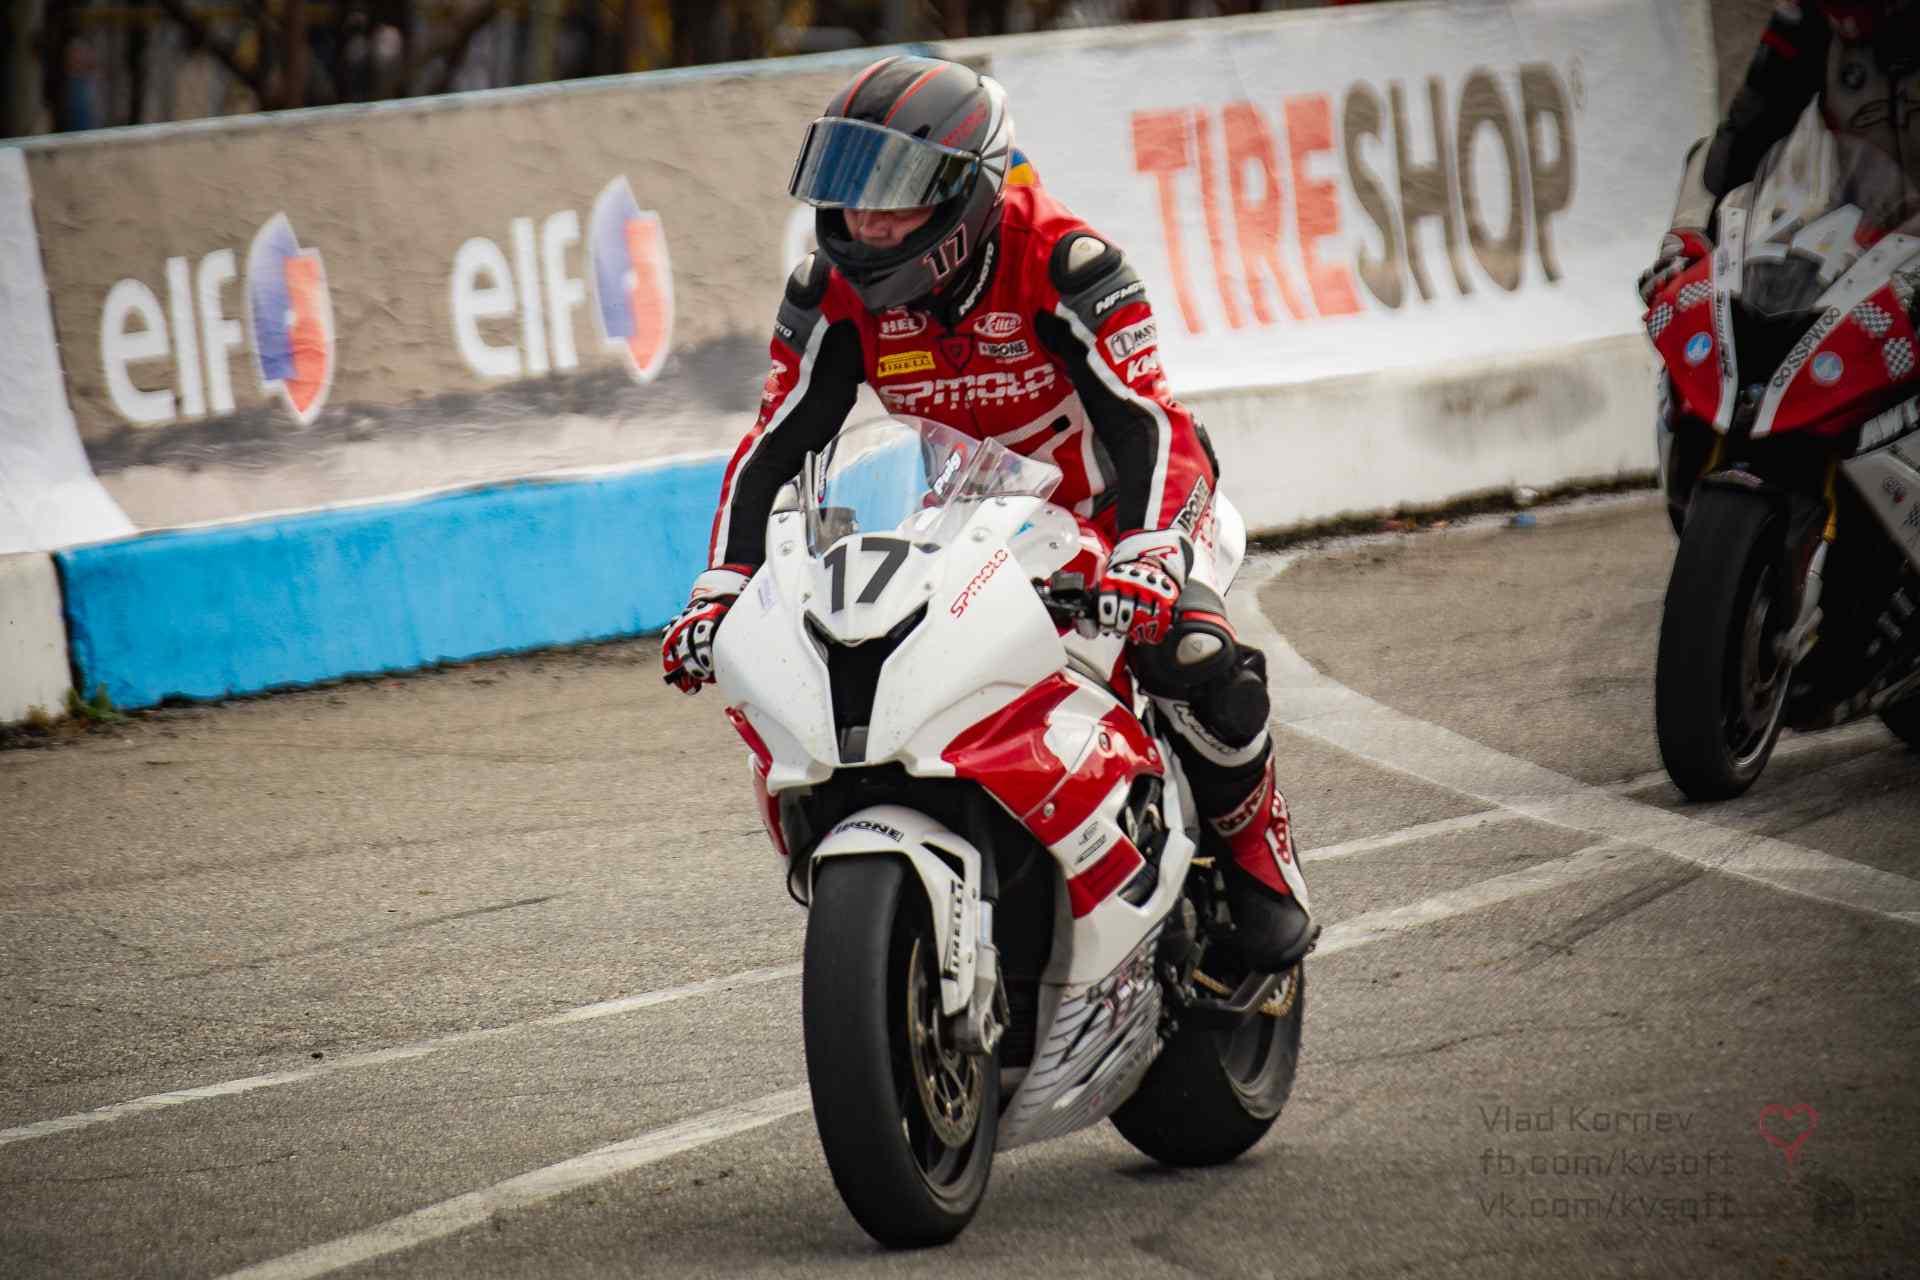 5-6_etap_MotoGPUkraine_051